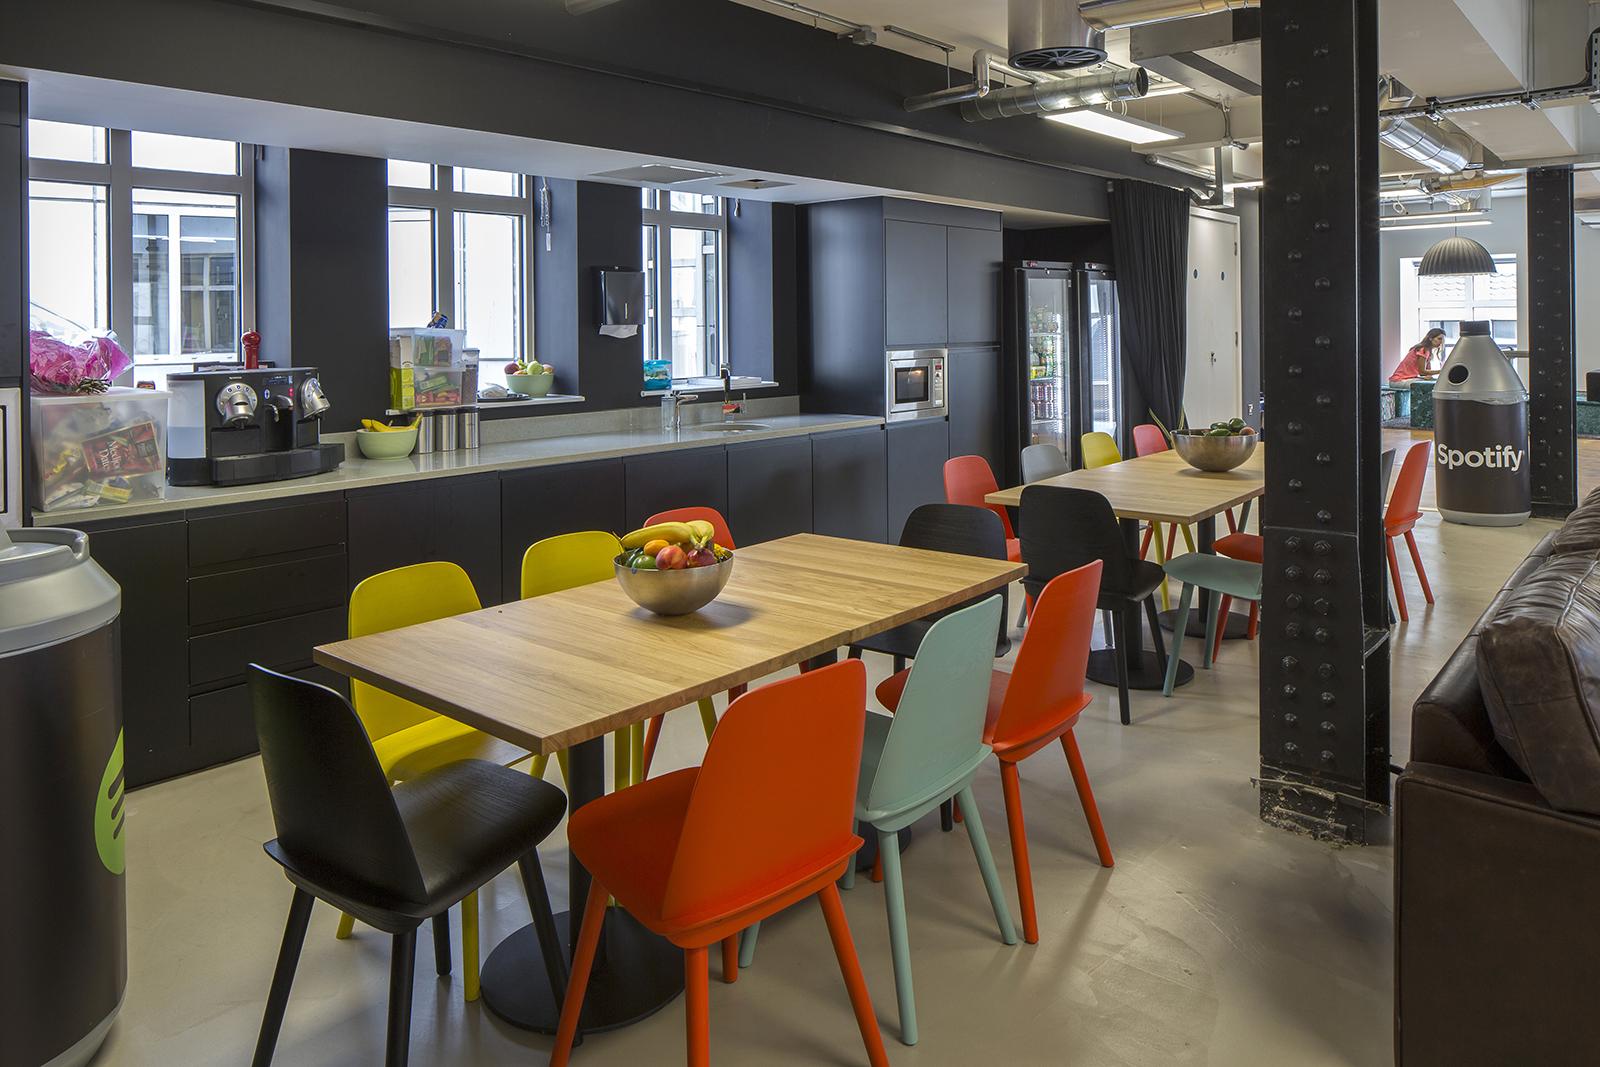 spotify-london-office-2